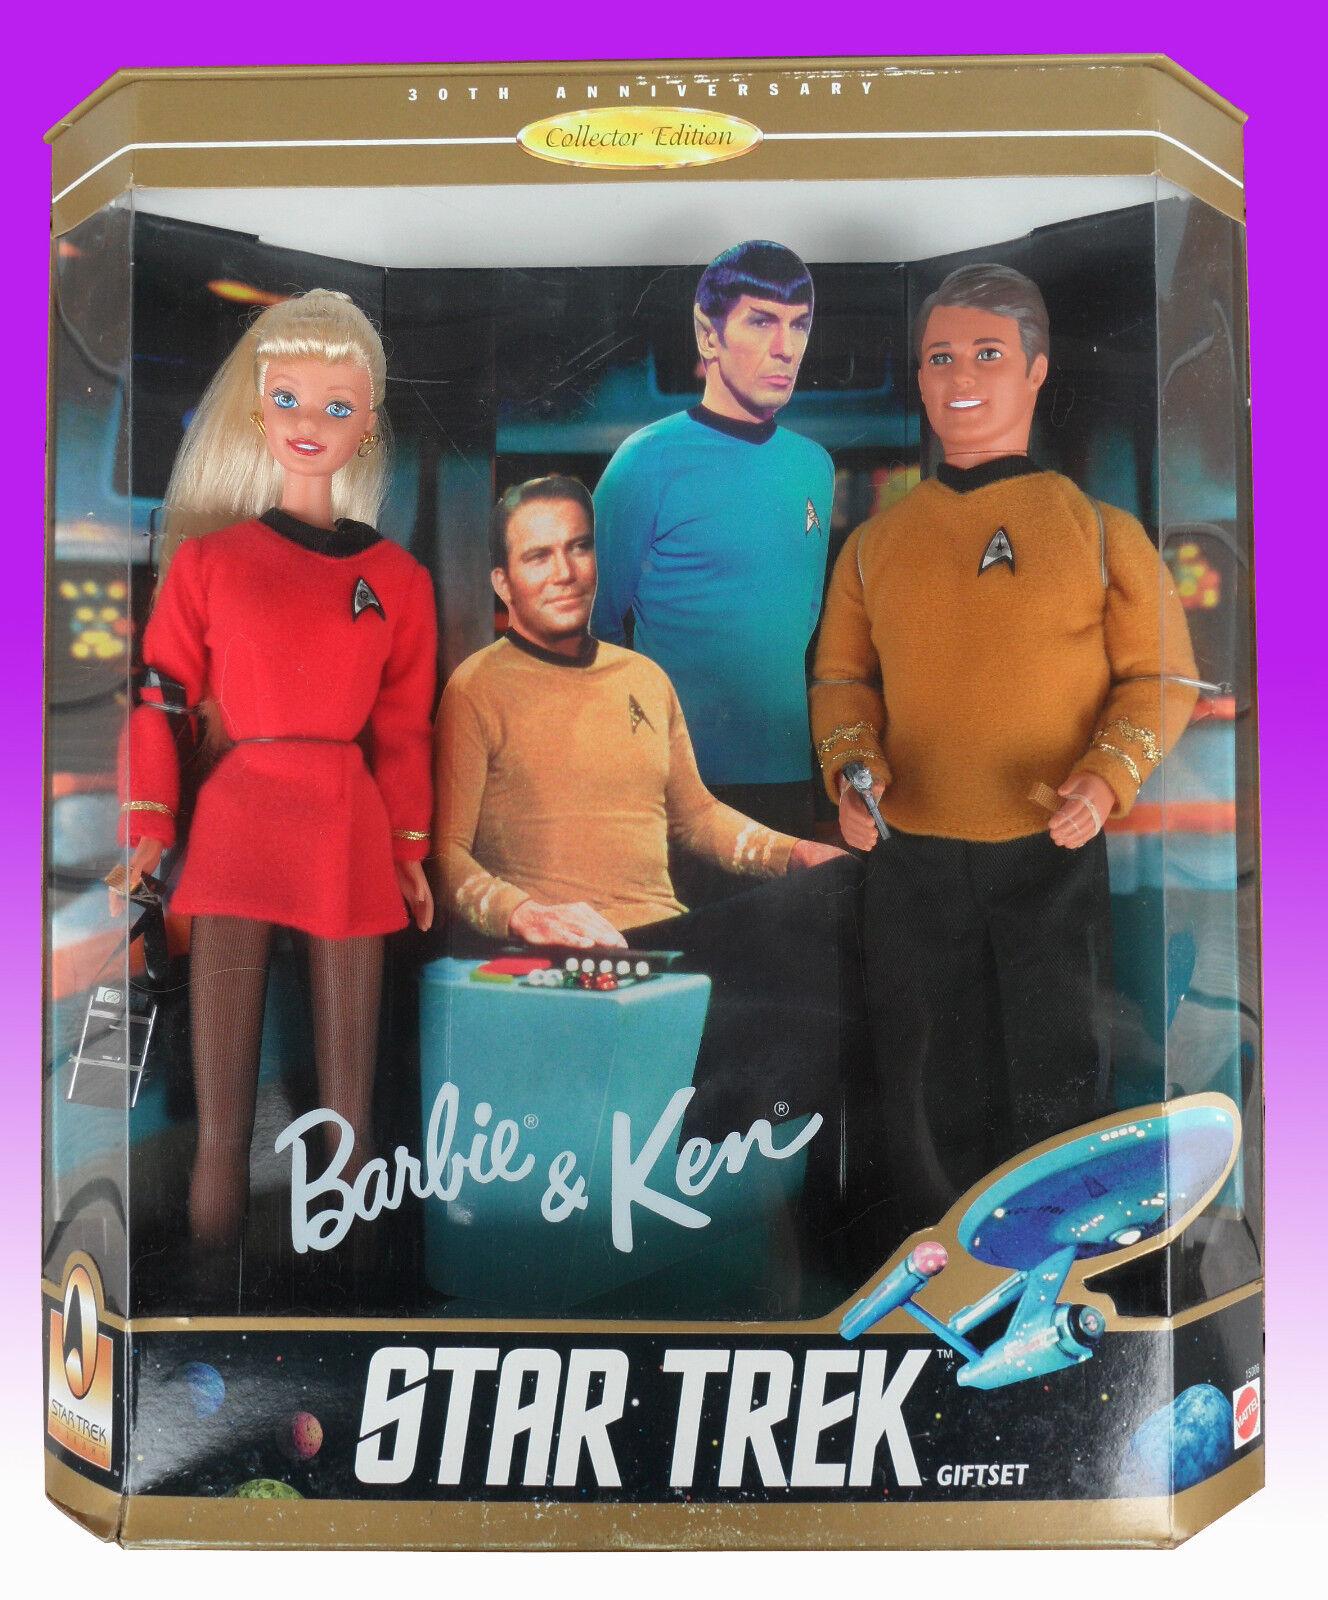 BARBIE e KEN STAR TREK Gift Set 1996 NRFB NUOVI PERFETTI